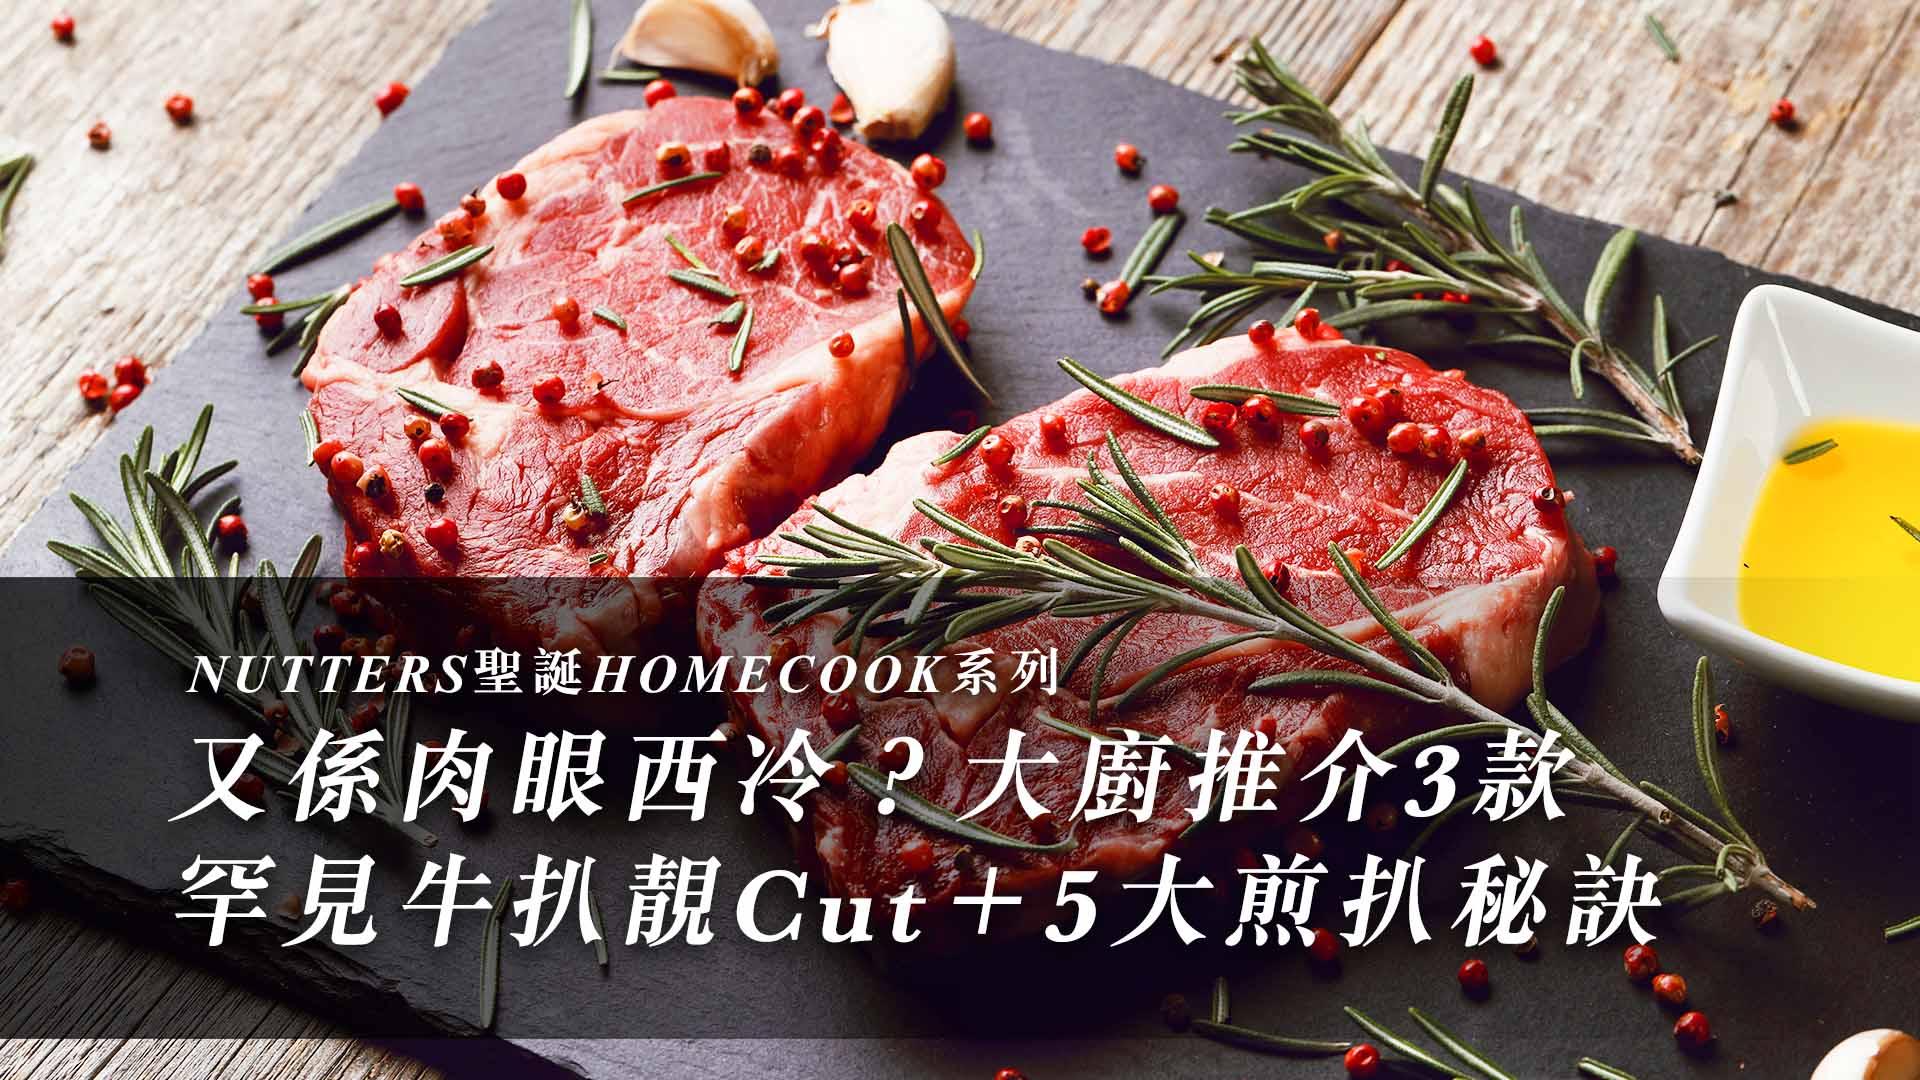 urban-nutters-steak-offcuts-christmas